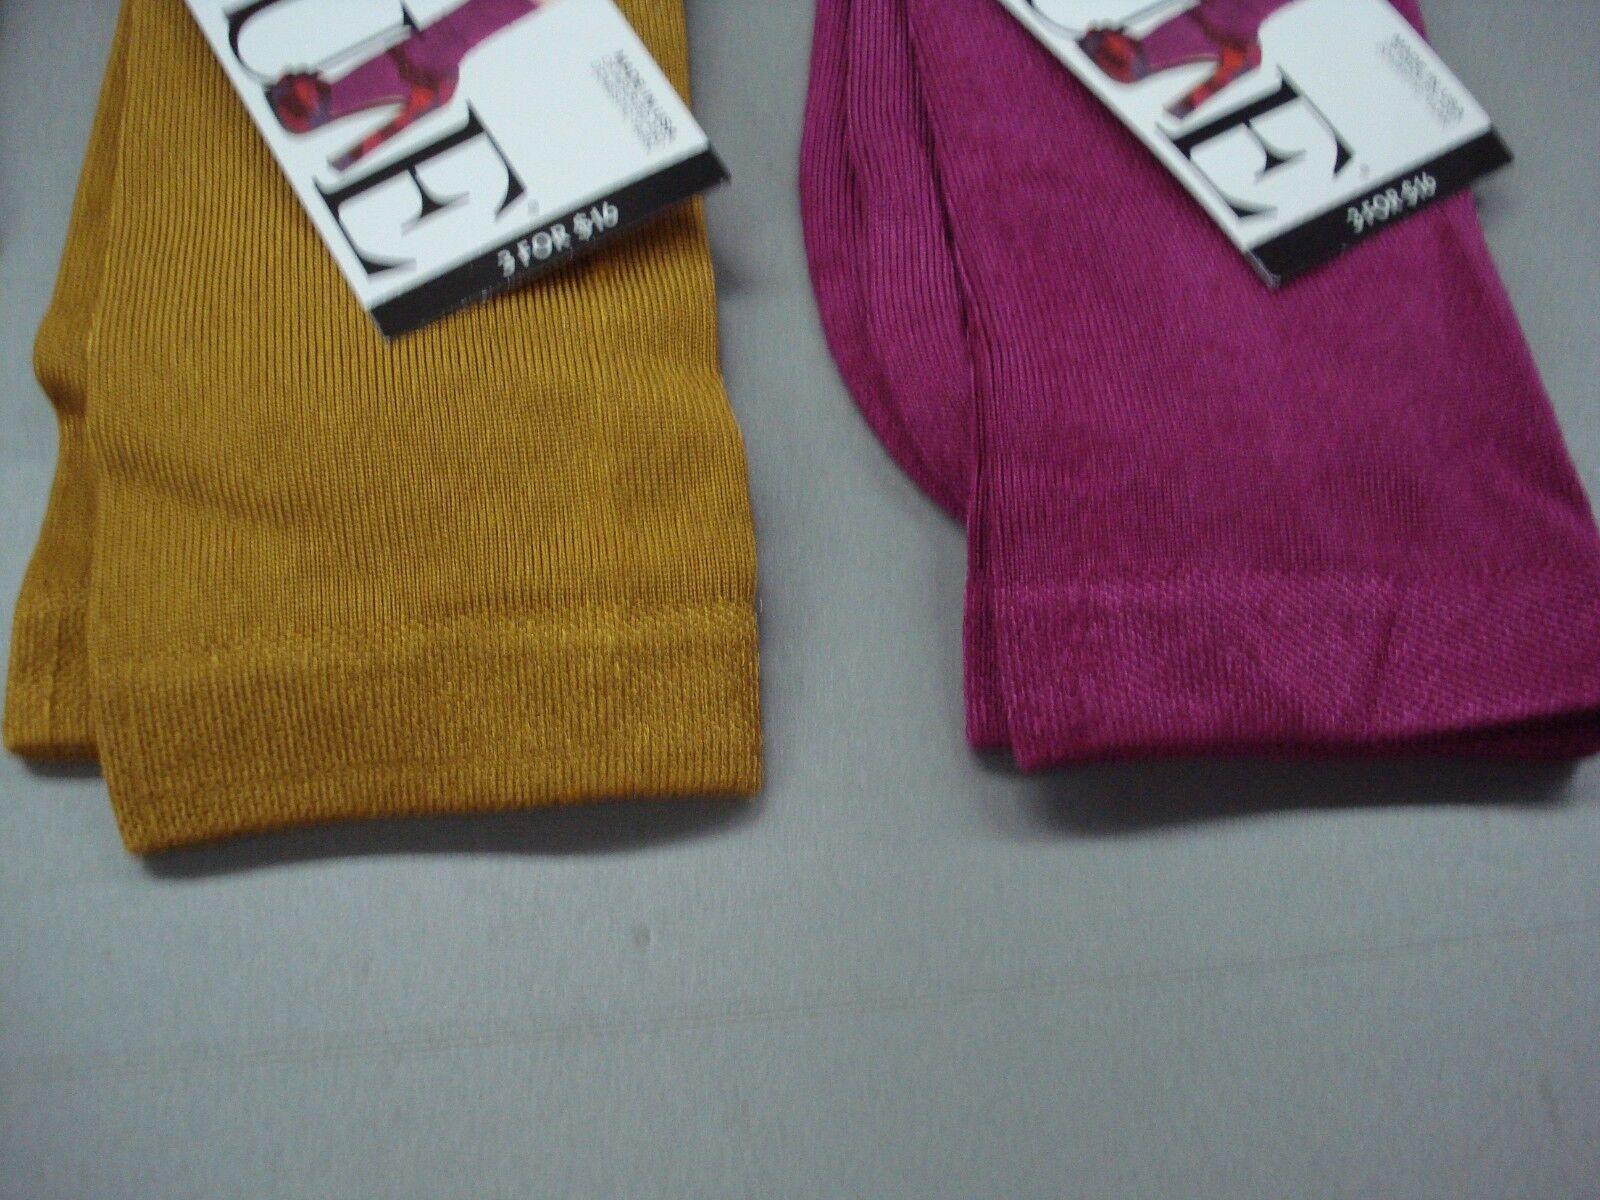 NWT Women/'s Hue Luster Flat Knit /& Brocade Socks One Size Multi 6 Pair #91J